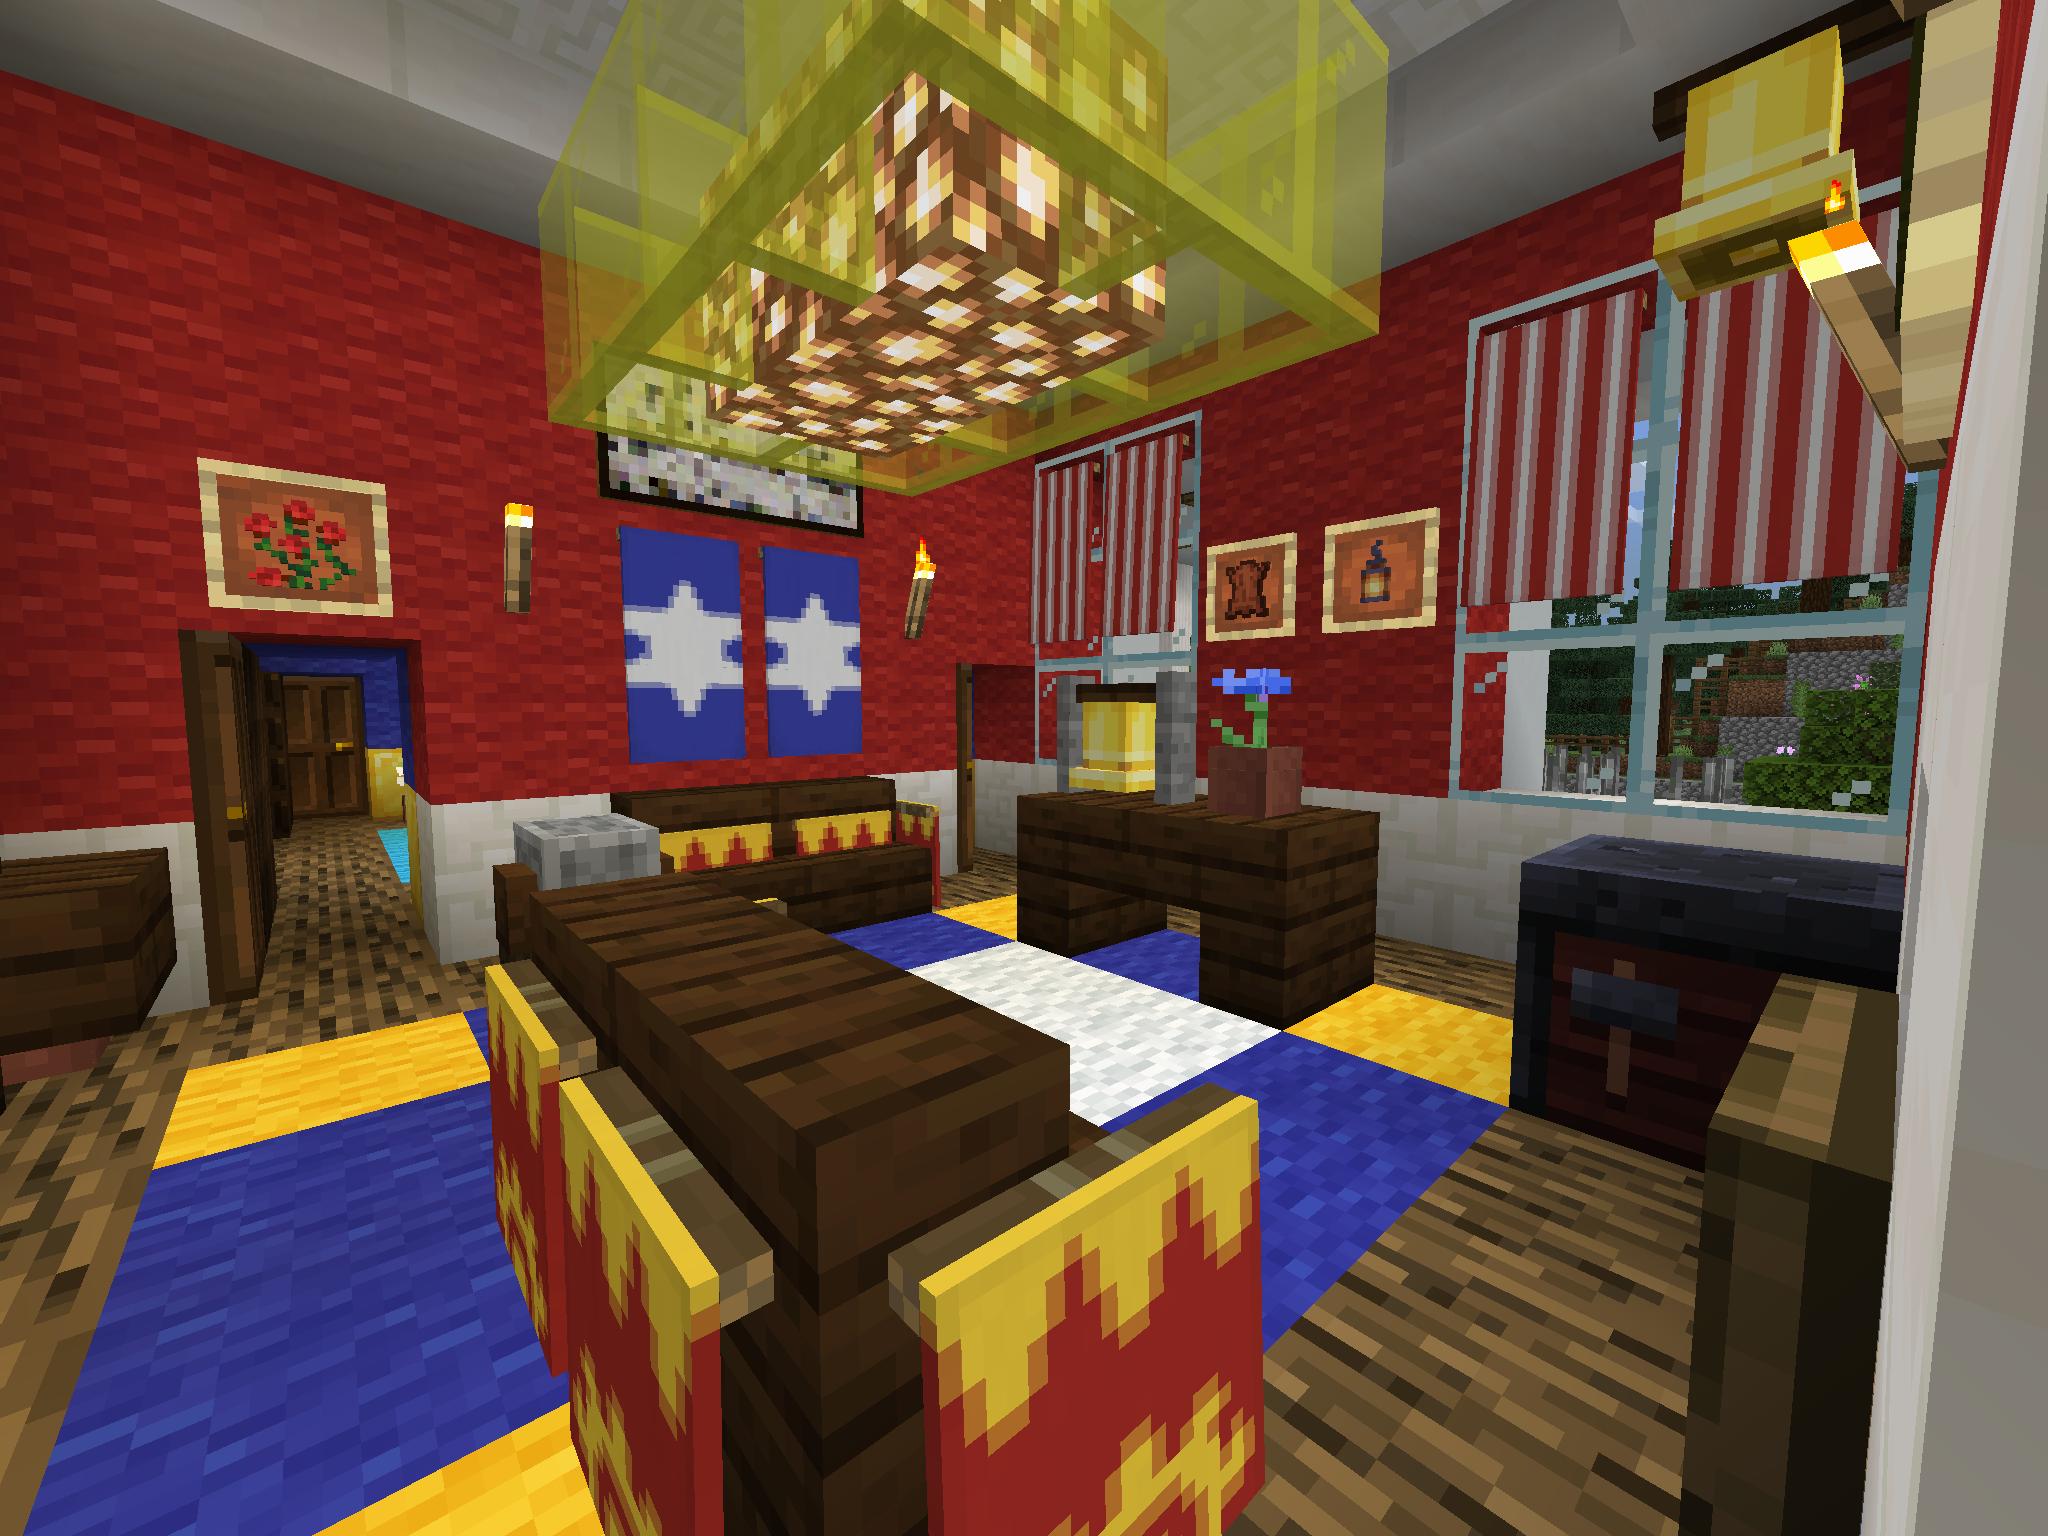 Minecraft bedroom (With images) | Minecraft bedroom ... |Minecraft Mansion Inside Bedroom